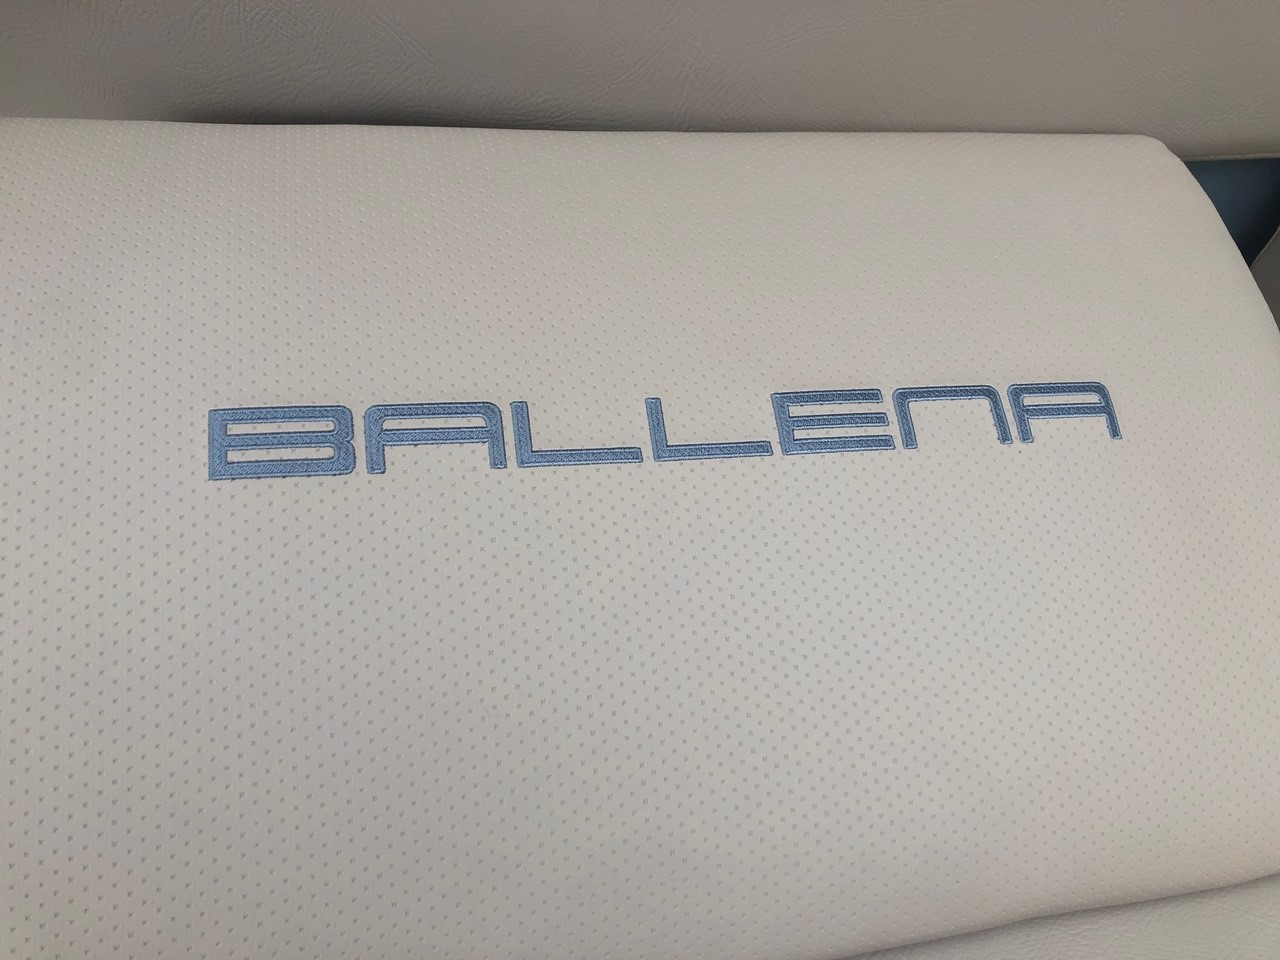 Ballena_1.jpg